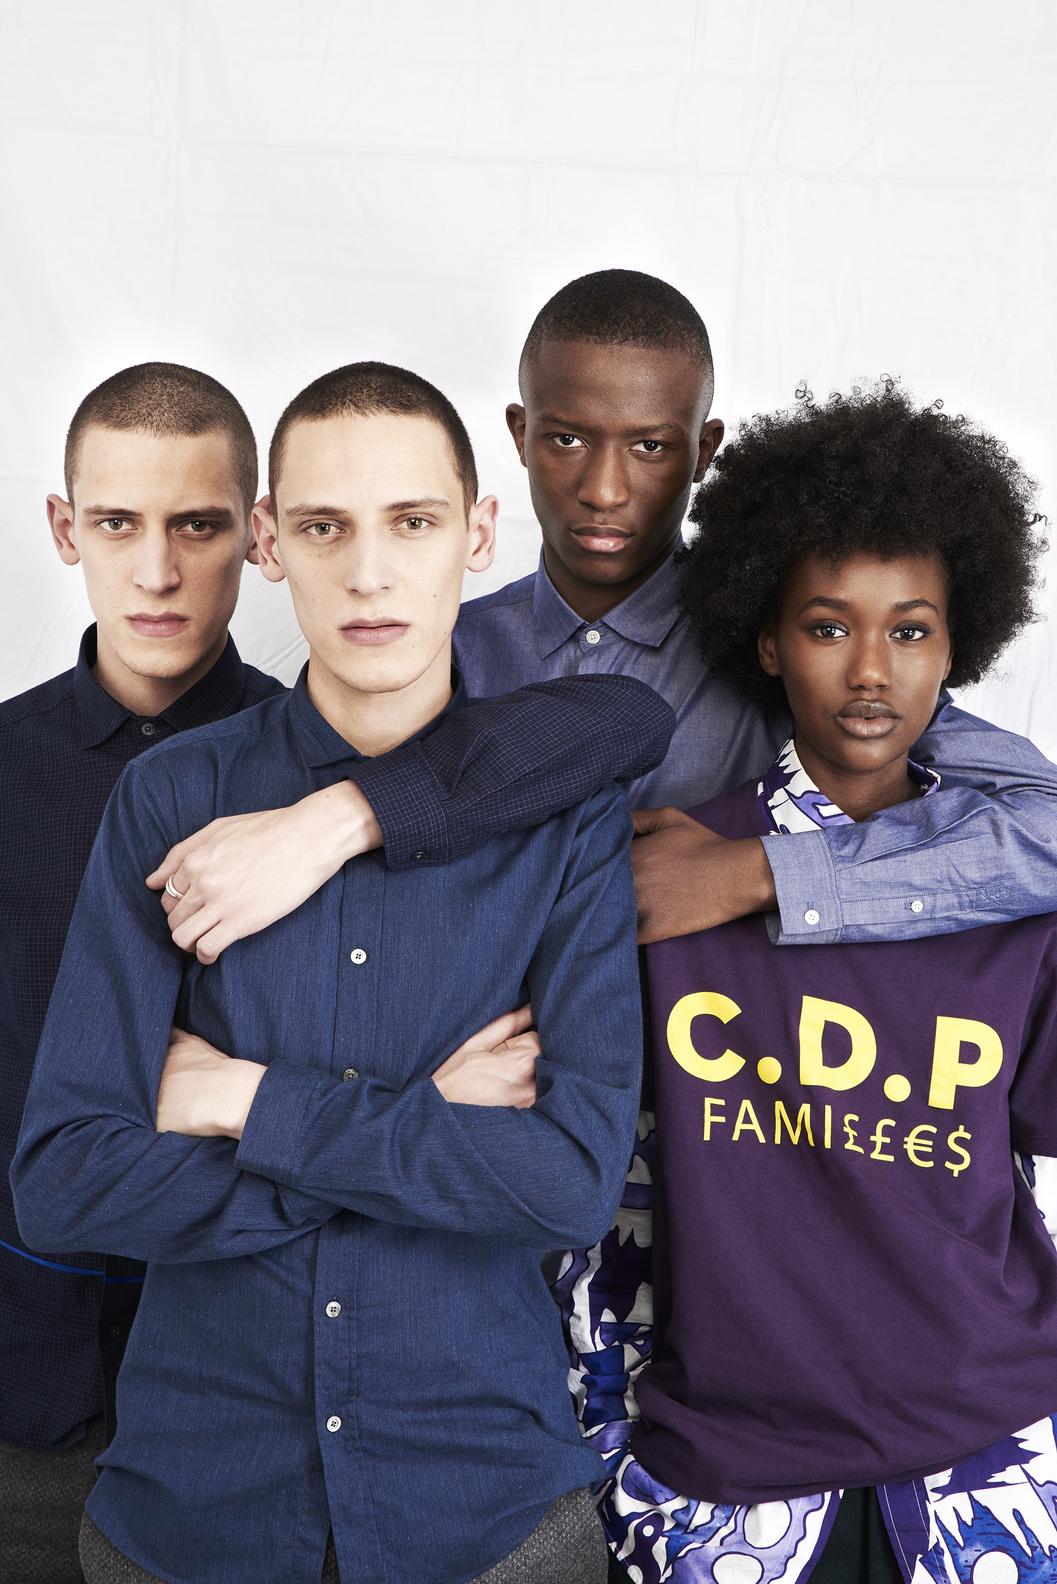 TEE CDP FAMILLES - Violet fonce